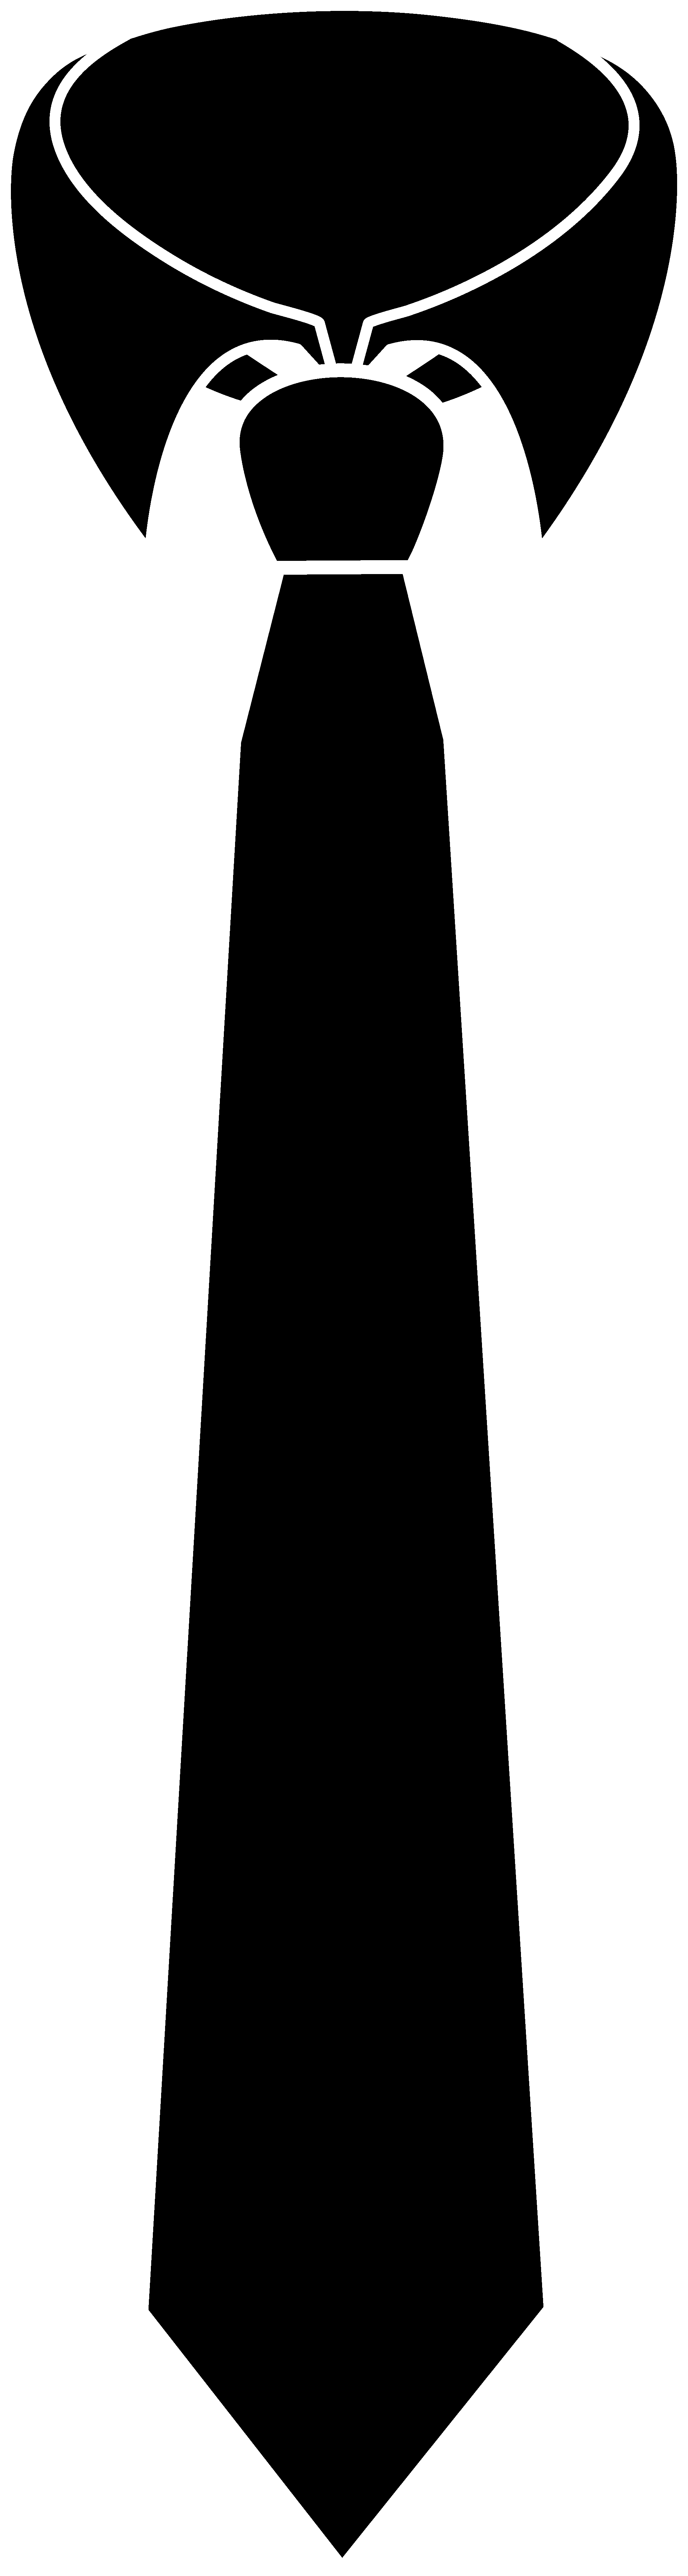 Free Black Tie Cliparts, Download Free Clip Art, Free Clip.